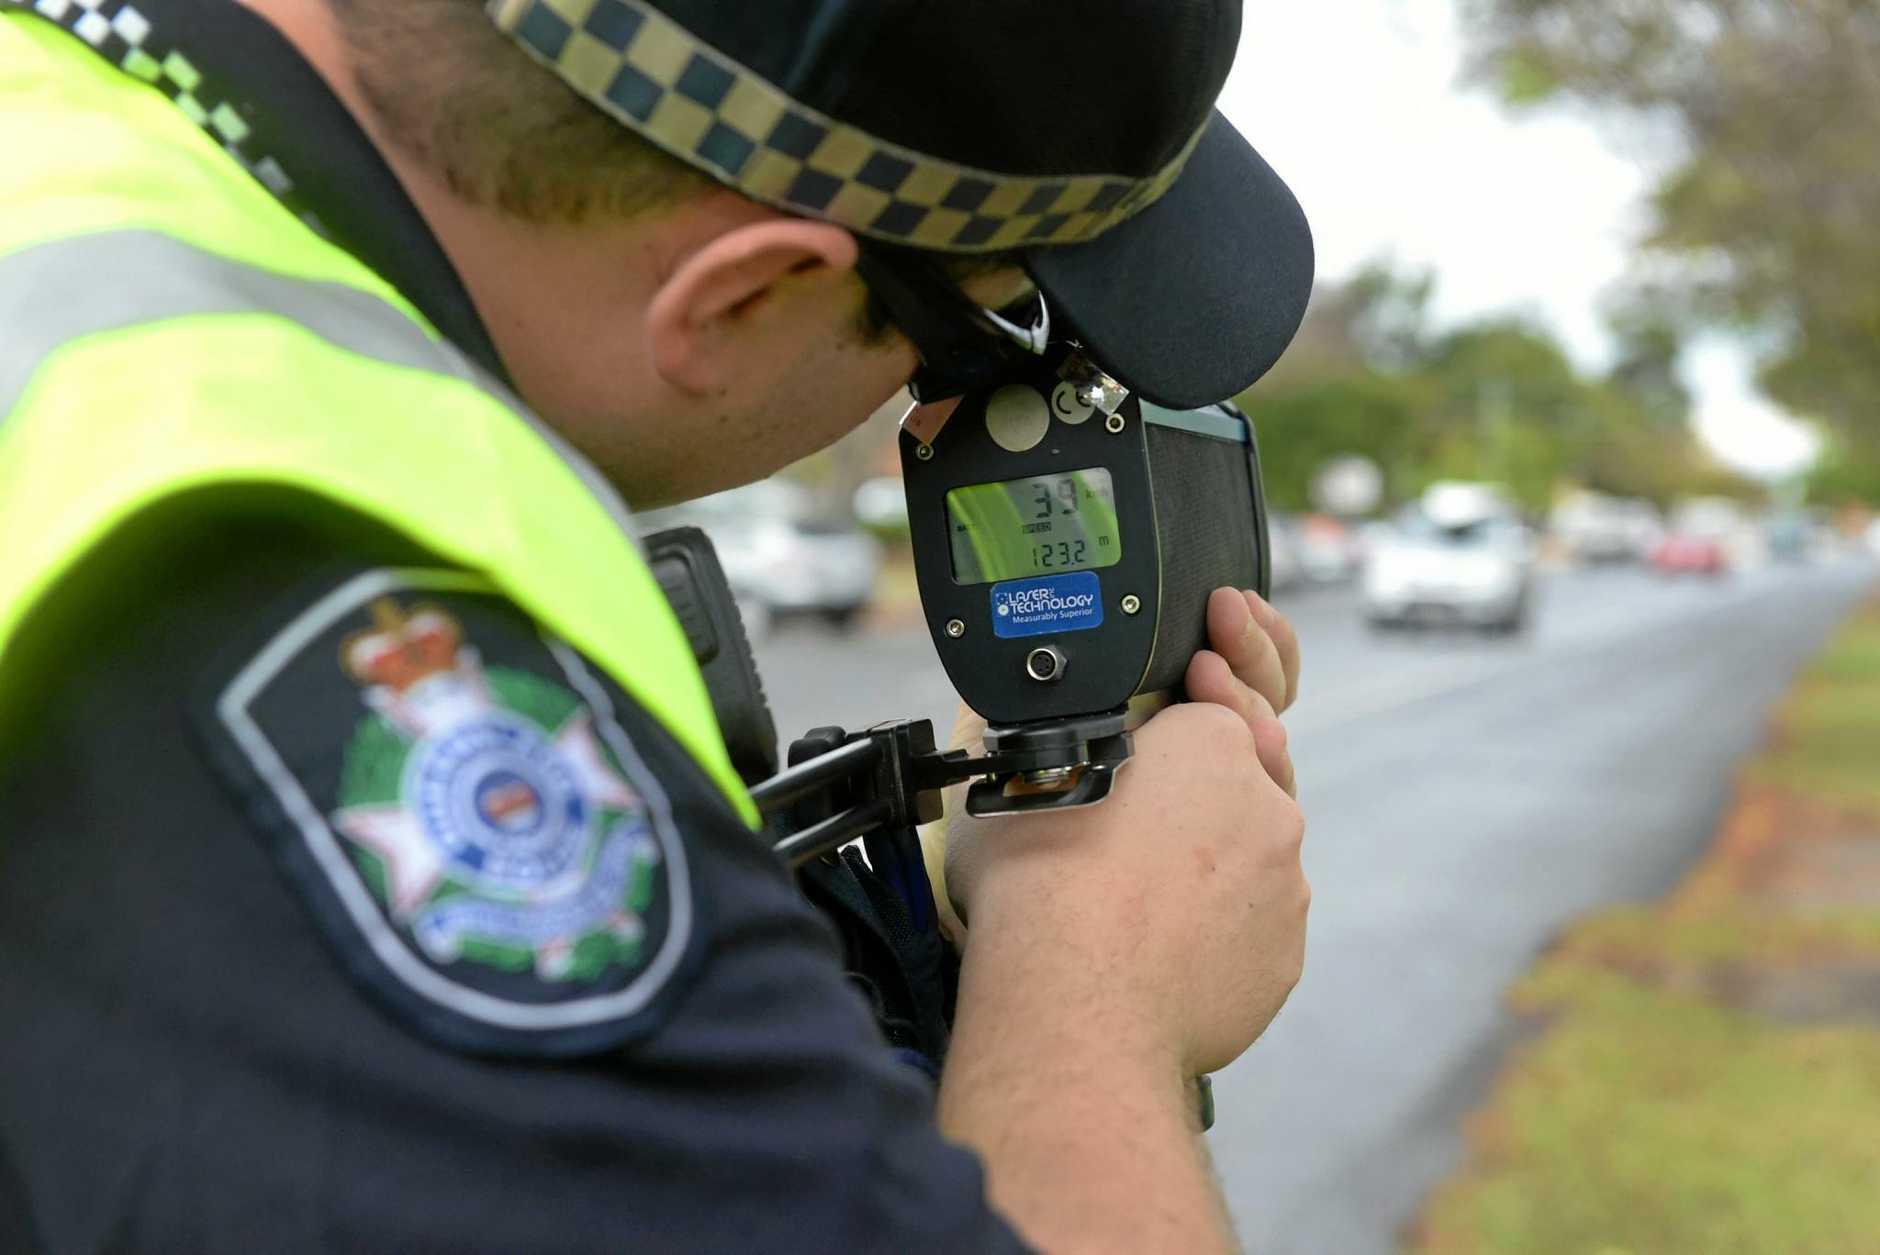 ROAD SAFETY WEEK: Police have nabbed some huge speeds this week.